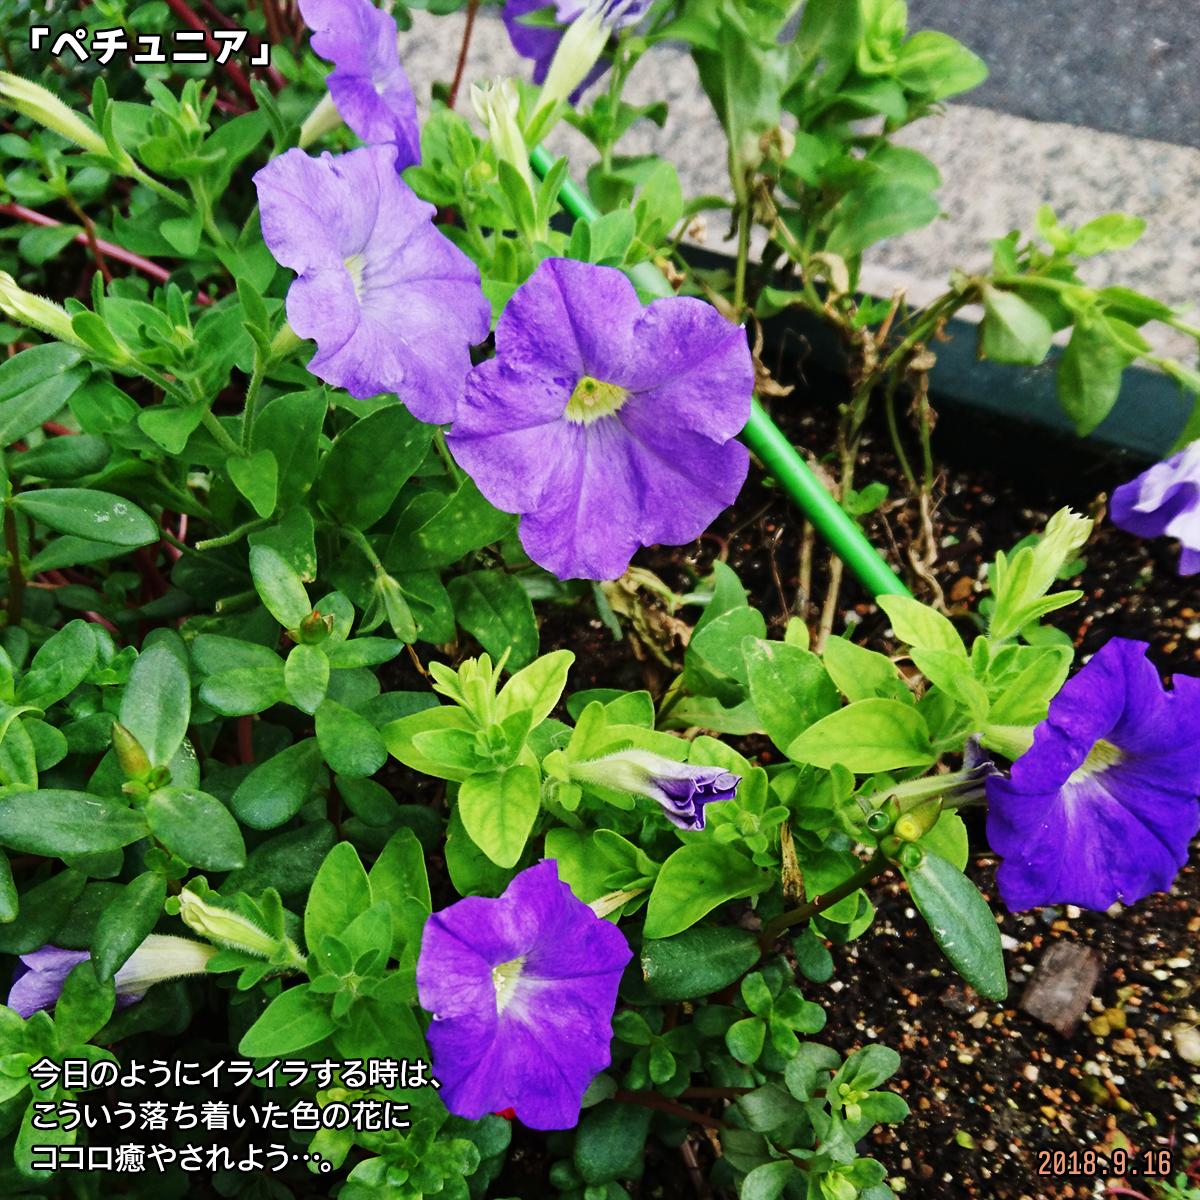 DSC_8205.jpg